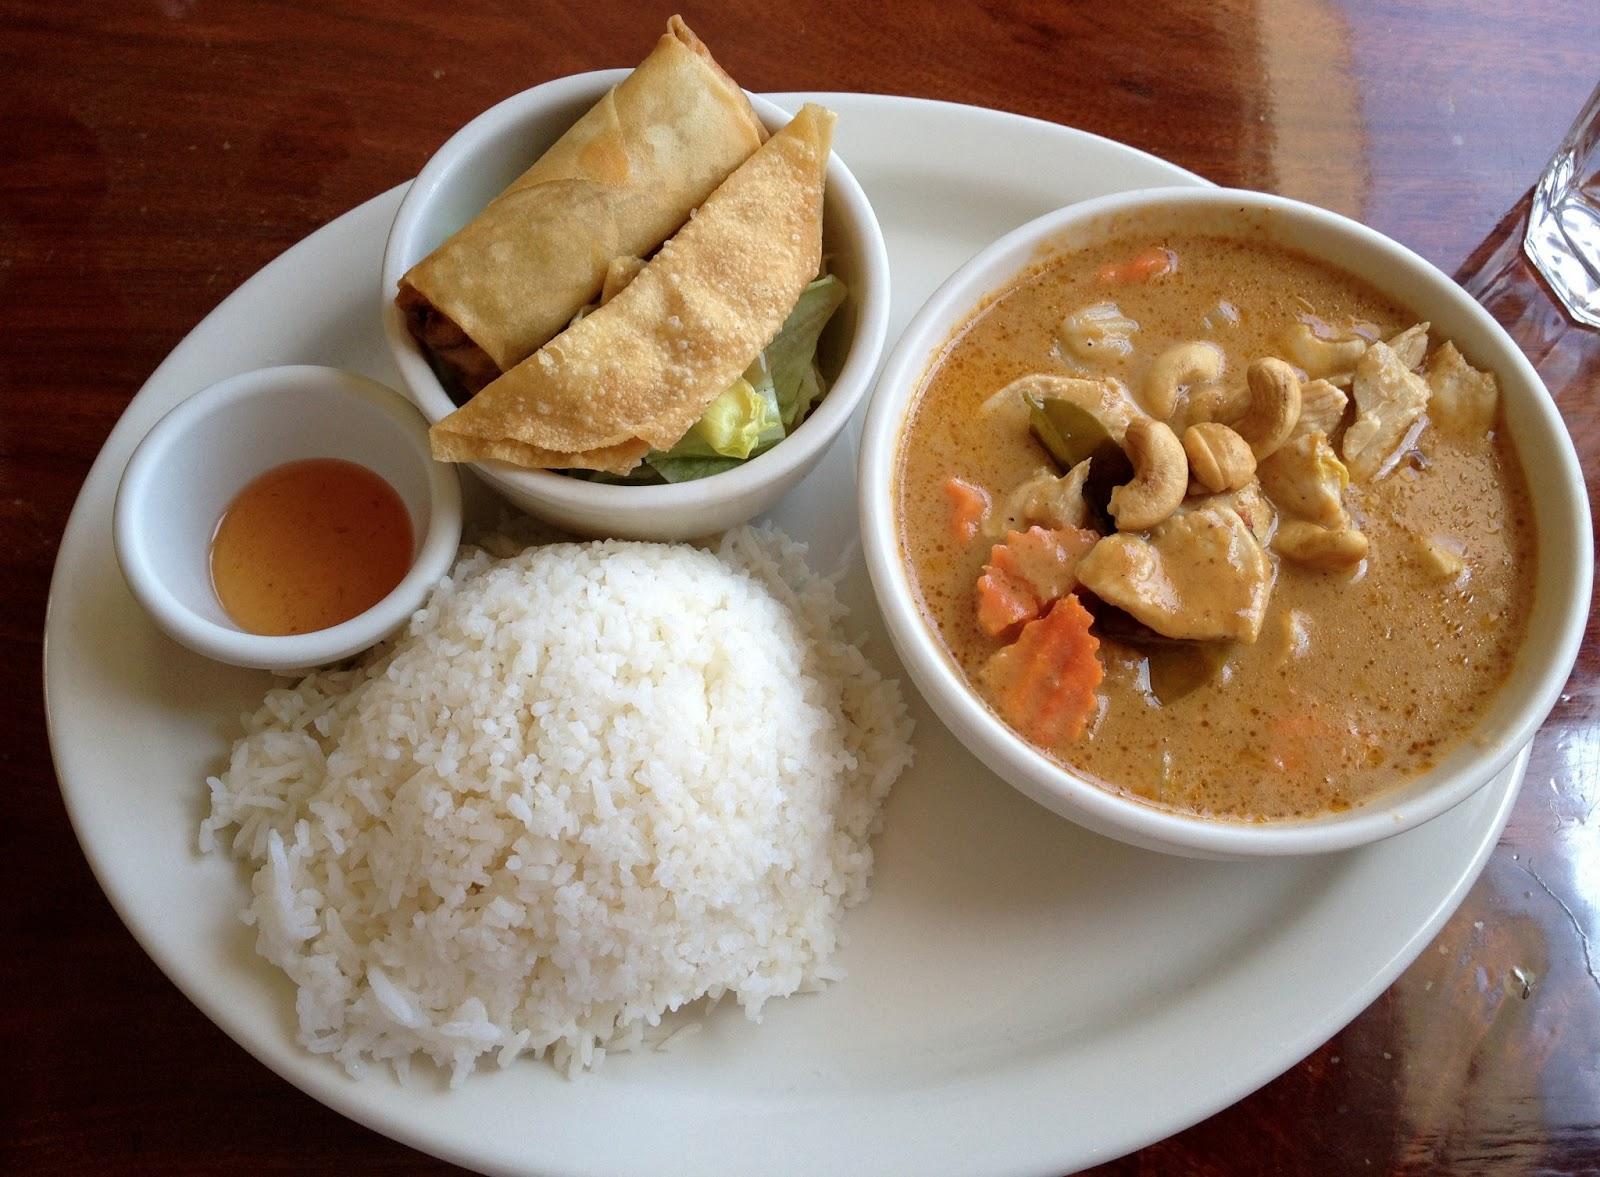 food blogger, food blog, thai village, thai food, massamum curry, curry, american fork, egg roll, rice